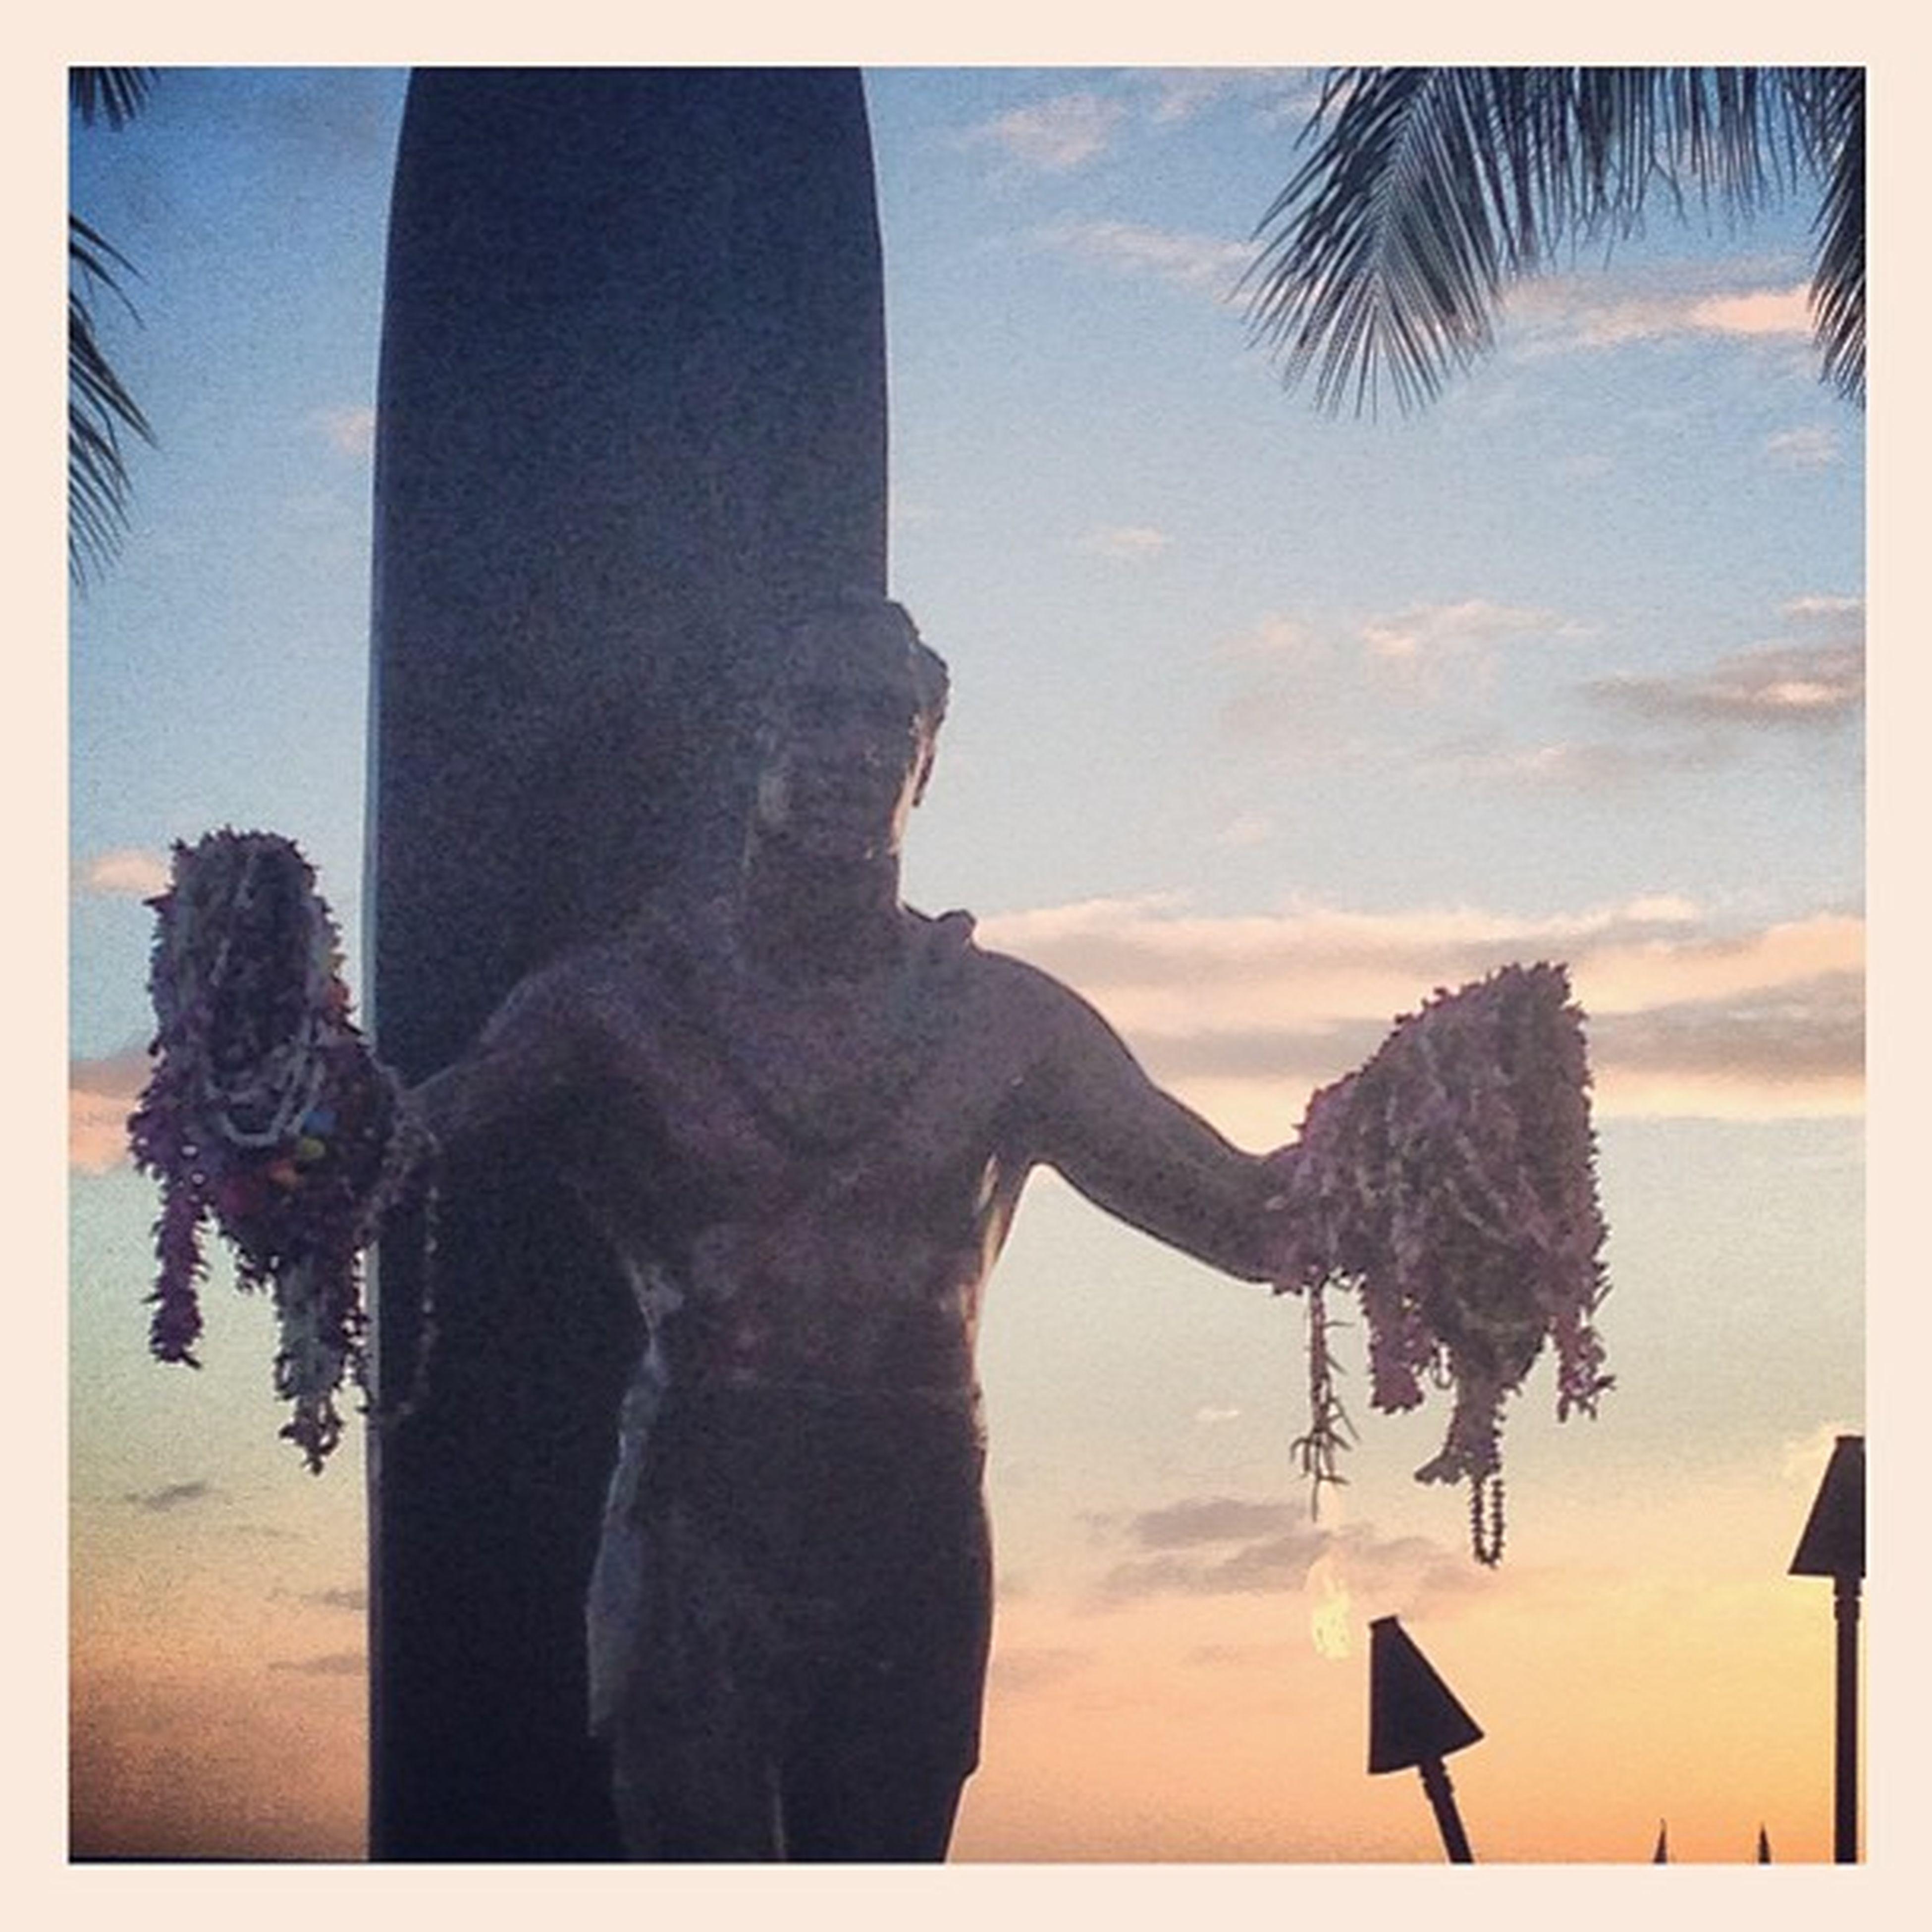 Hawaiiandude Statue Leis Respect surfer surfboard hawaii waikiki oahu sunset sky scenery